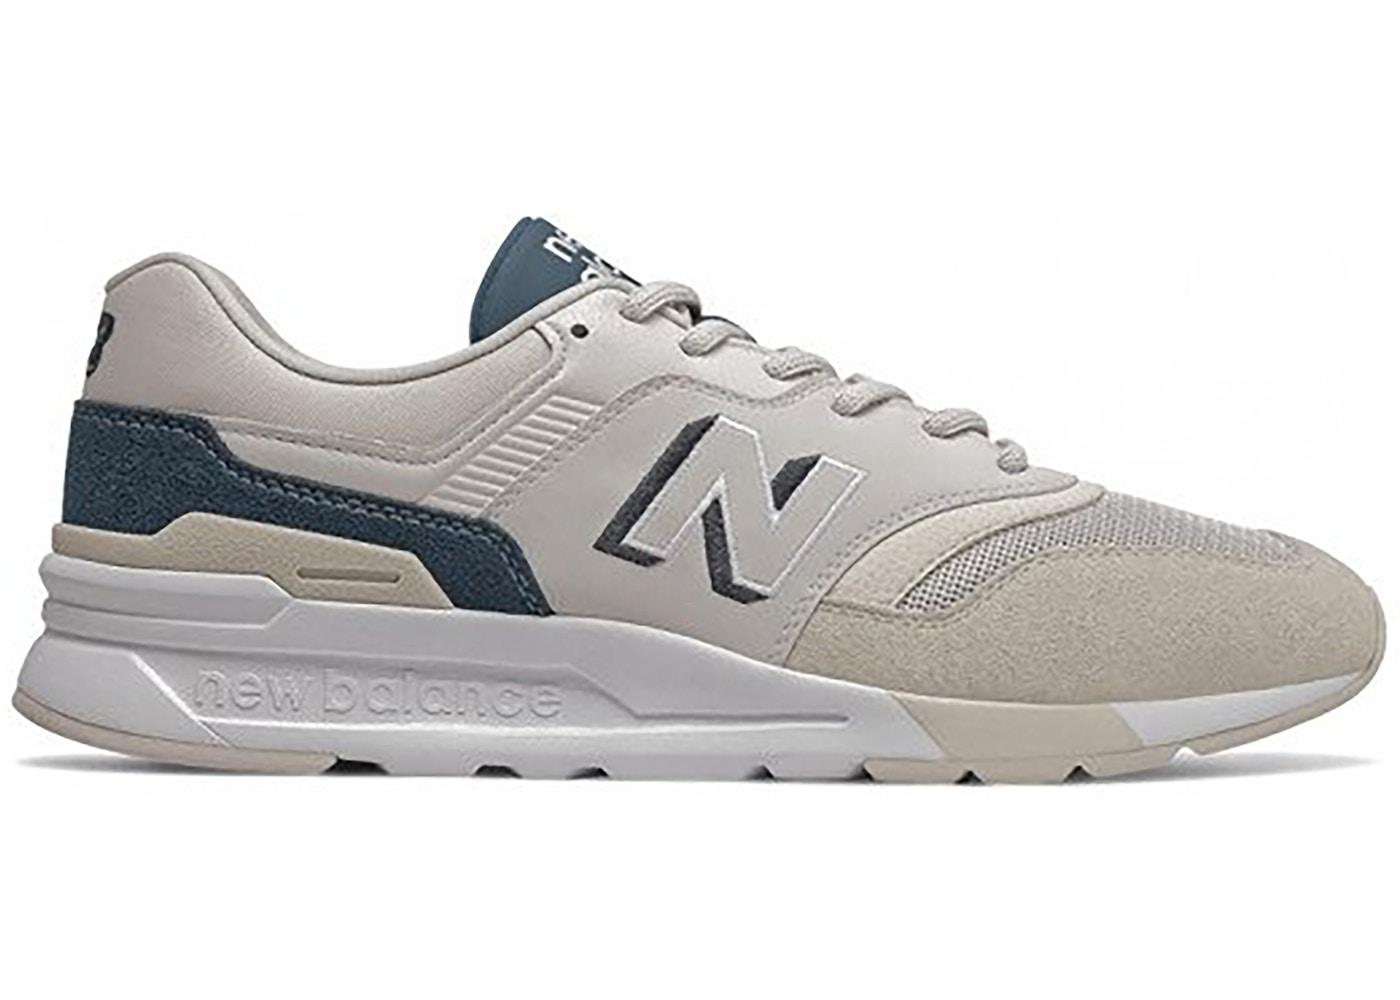 New Balance 997 Beige Blue